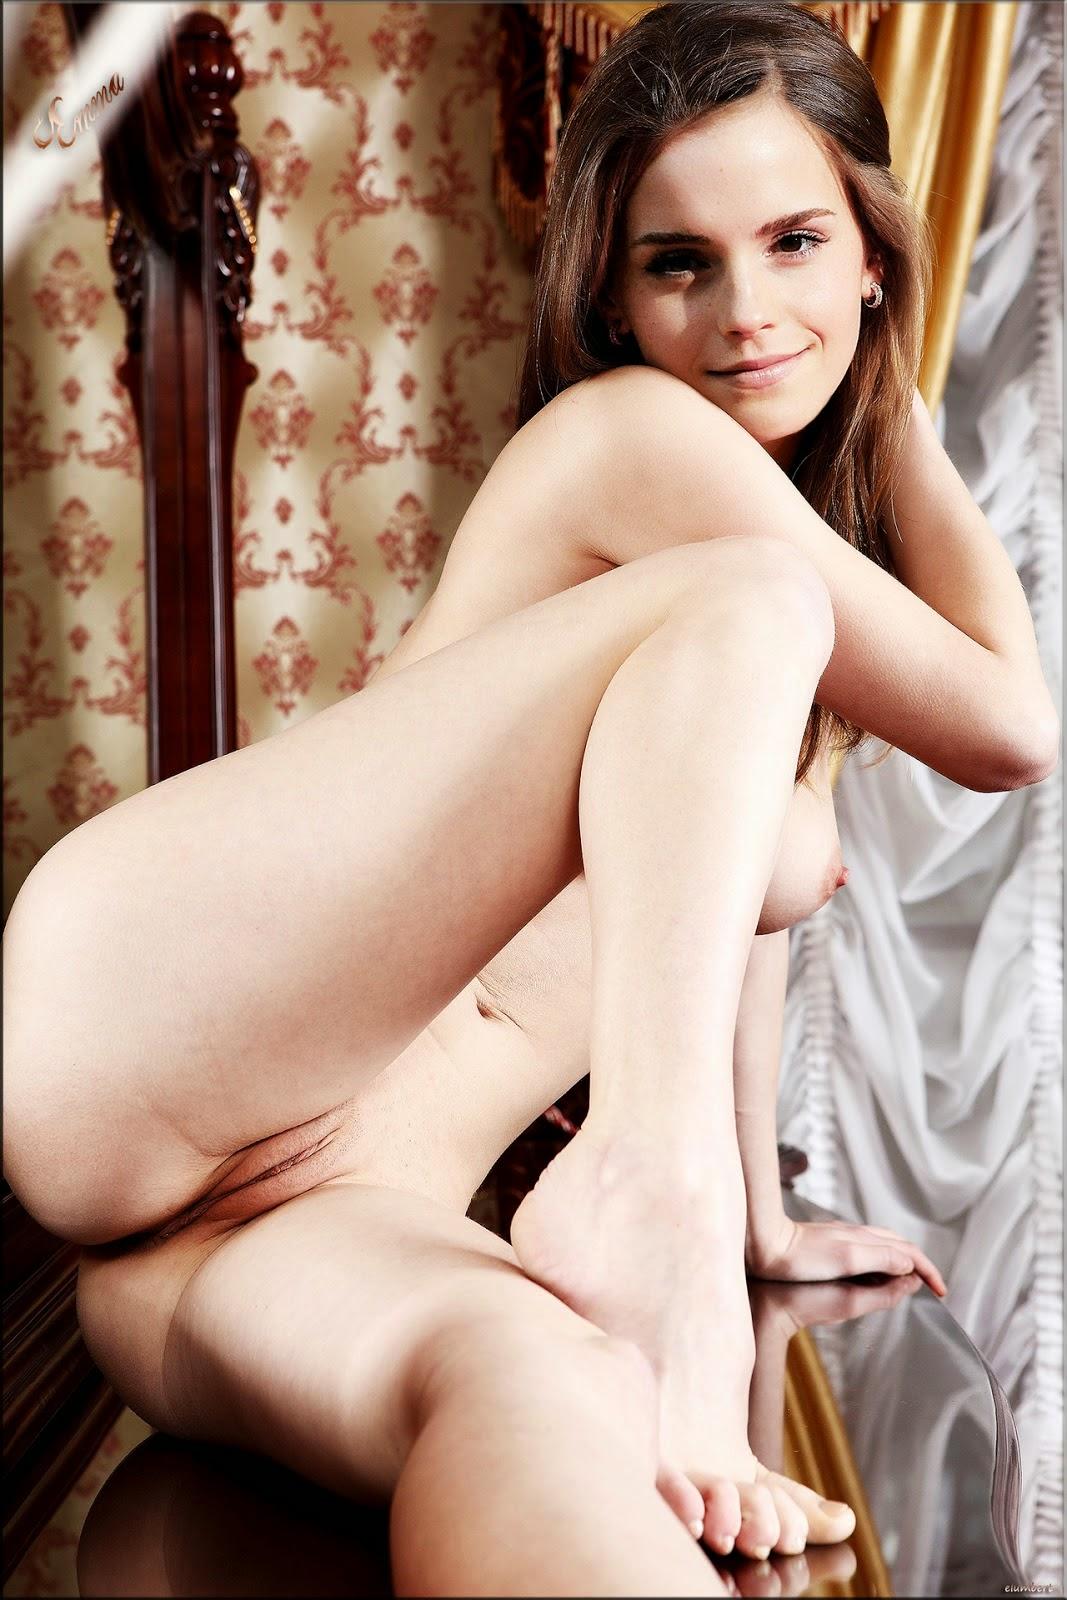 EMA WATOSON PUSSY Emma Watson nude · undefined